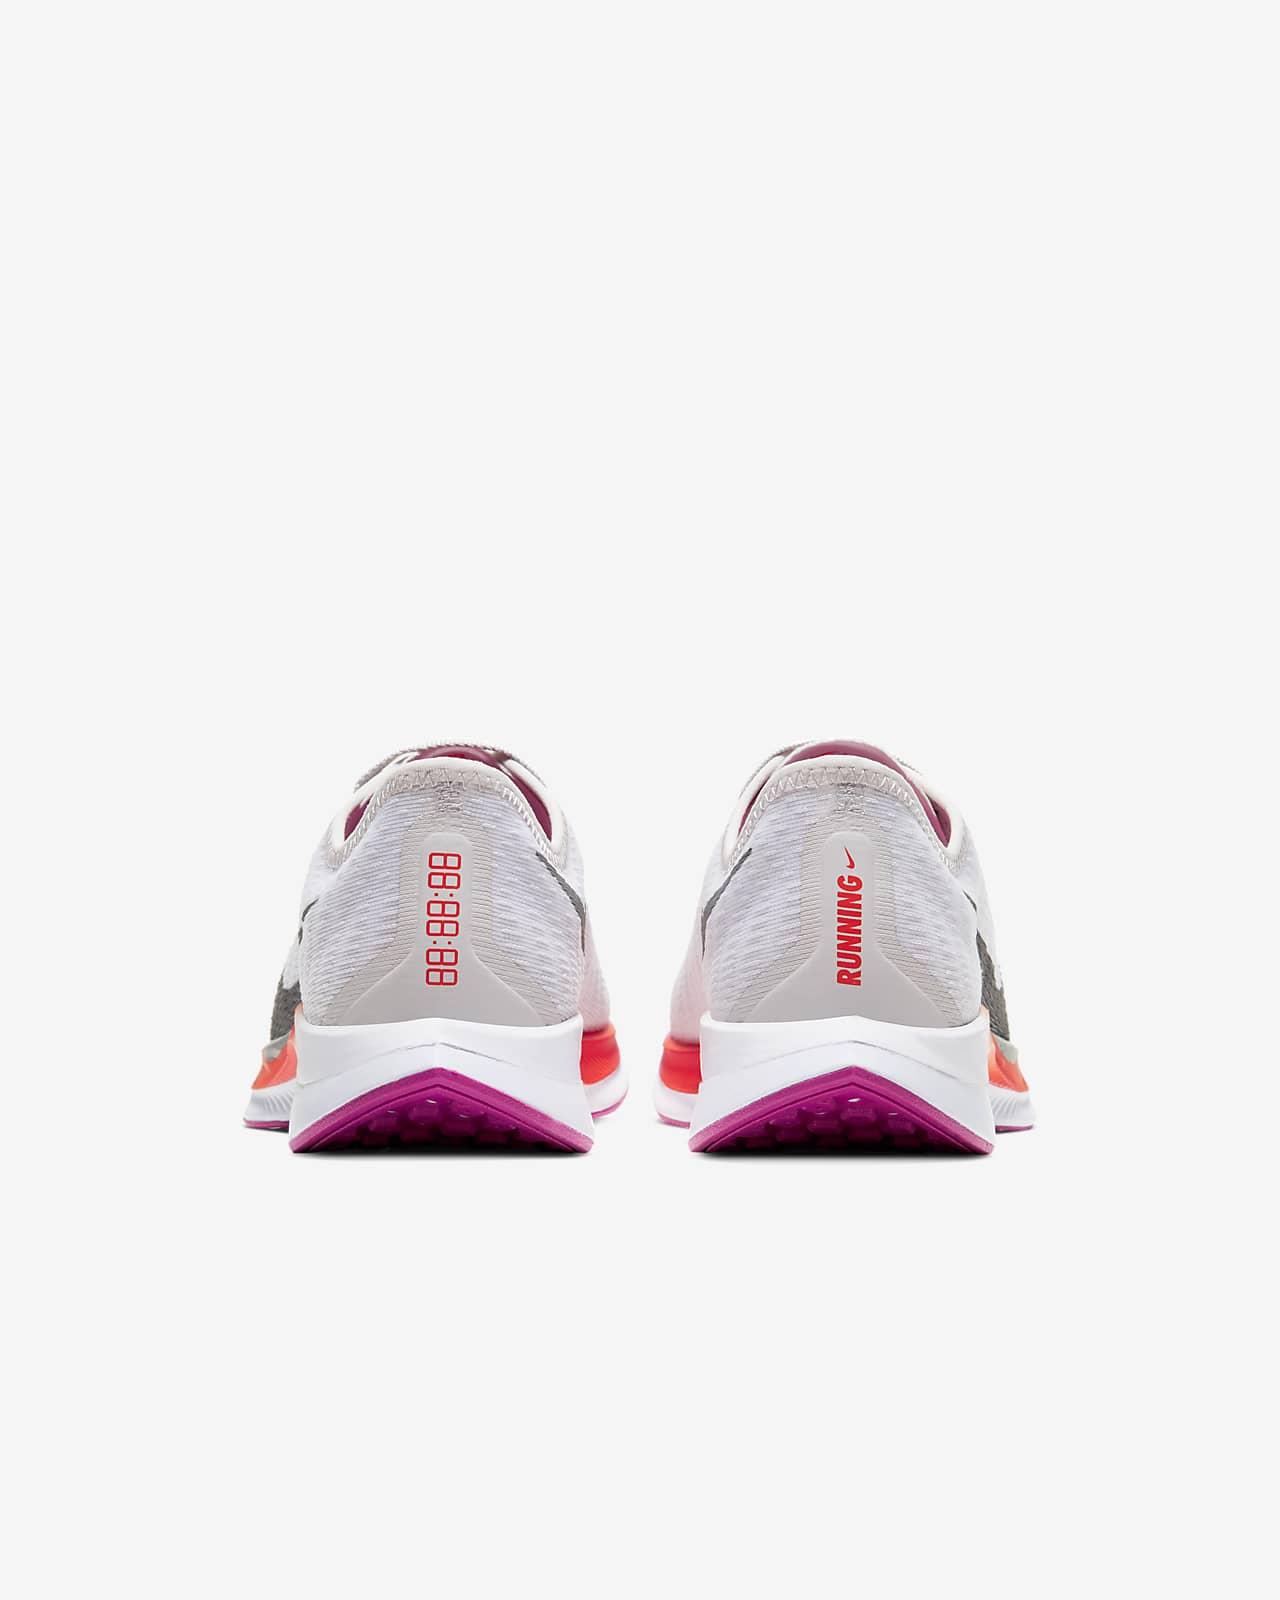 chaussure nike zoom touti les couleur femme